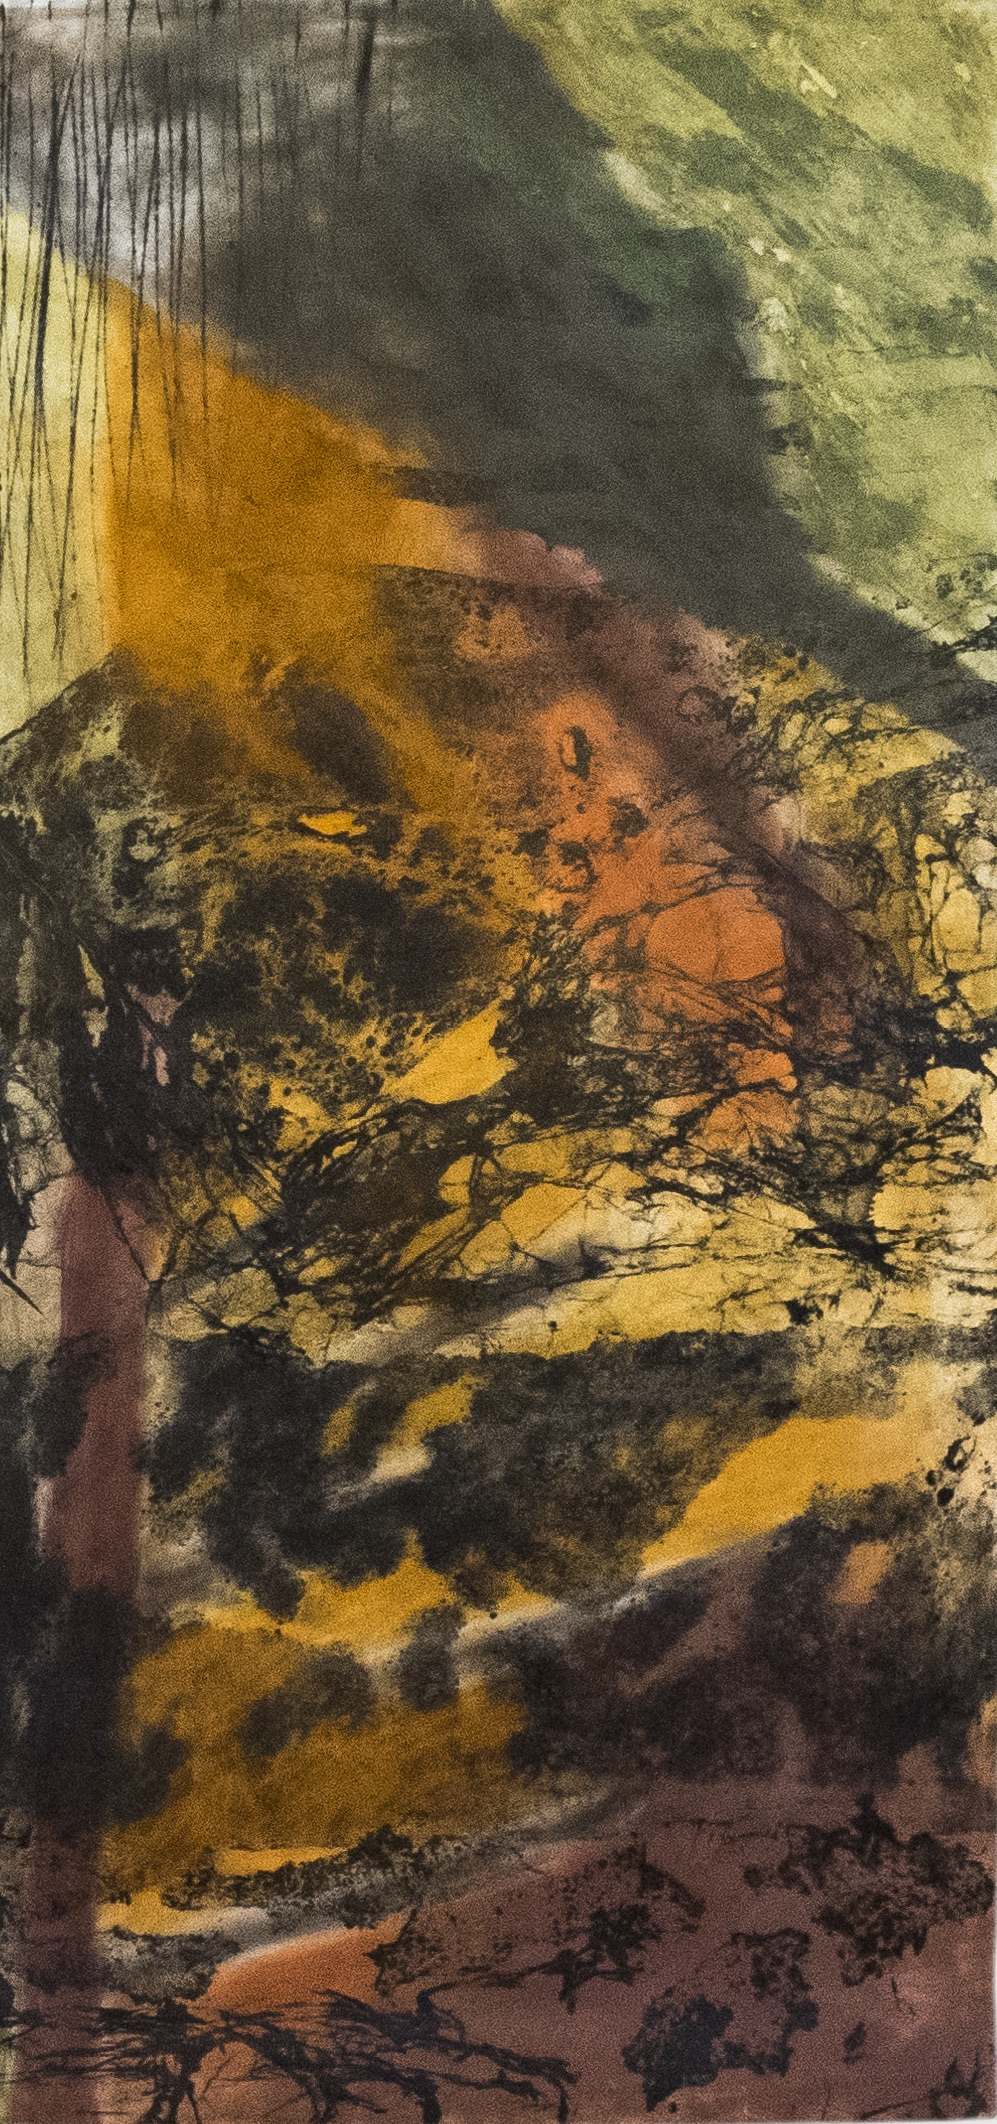 Alison Lochhead - Parys Mountain III (2016), collograph print